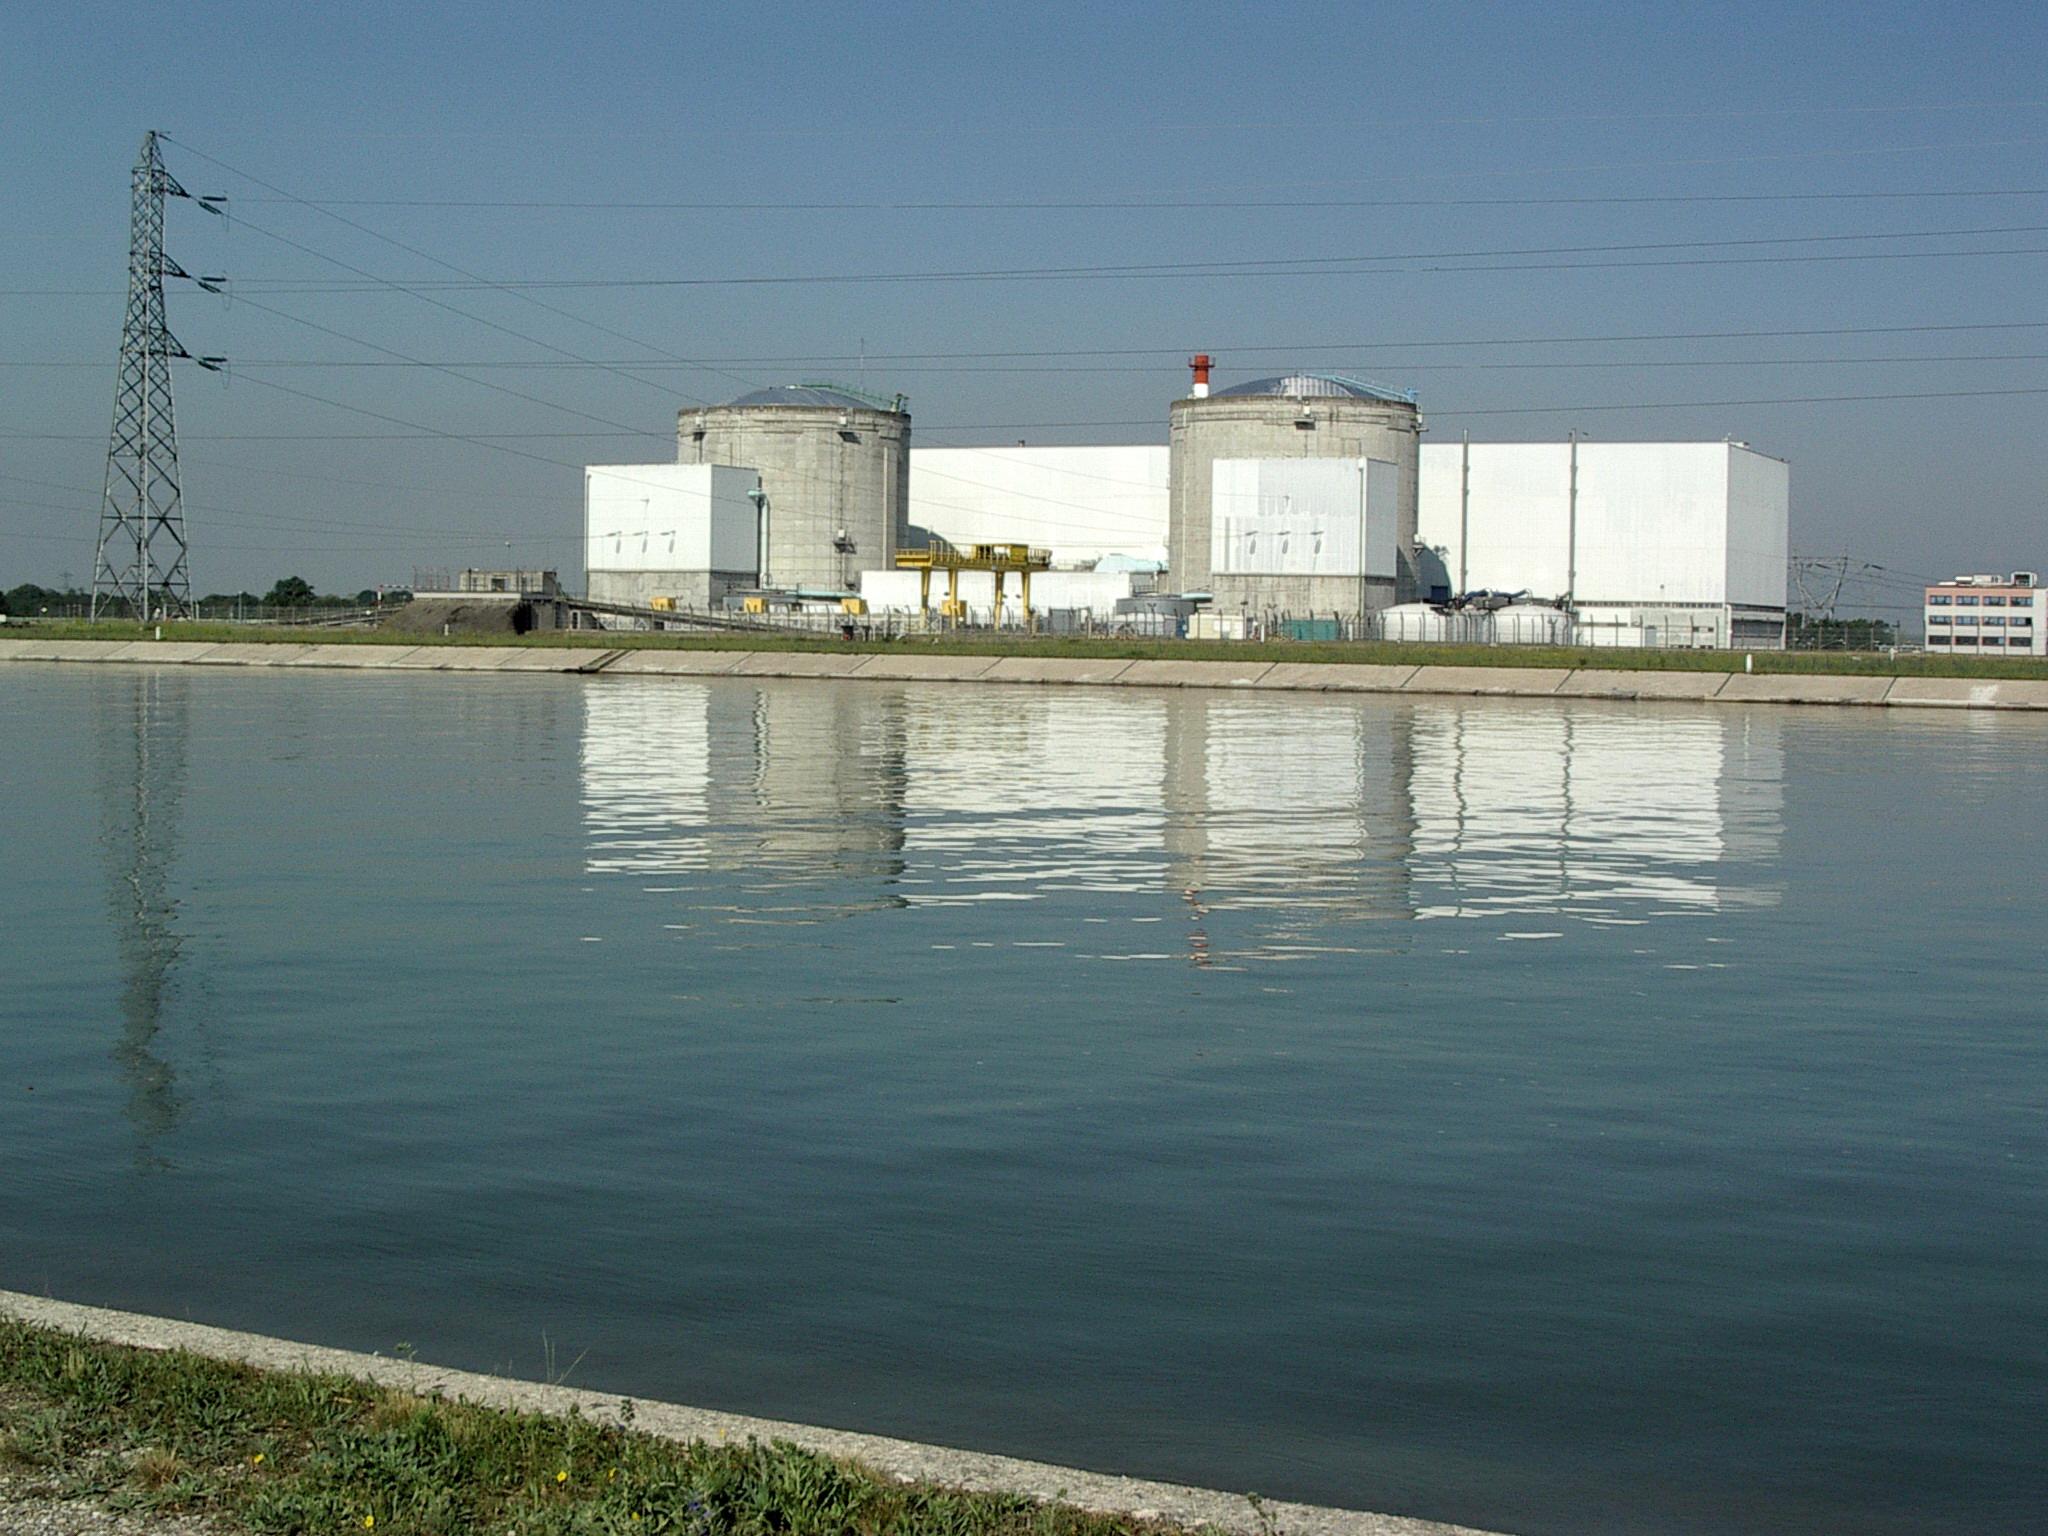 centralenucleairedefessenheim2.jpg